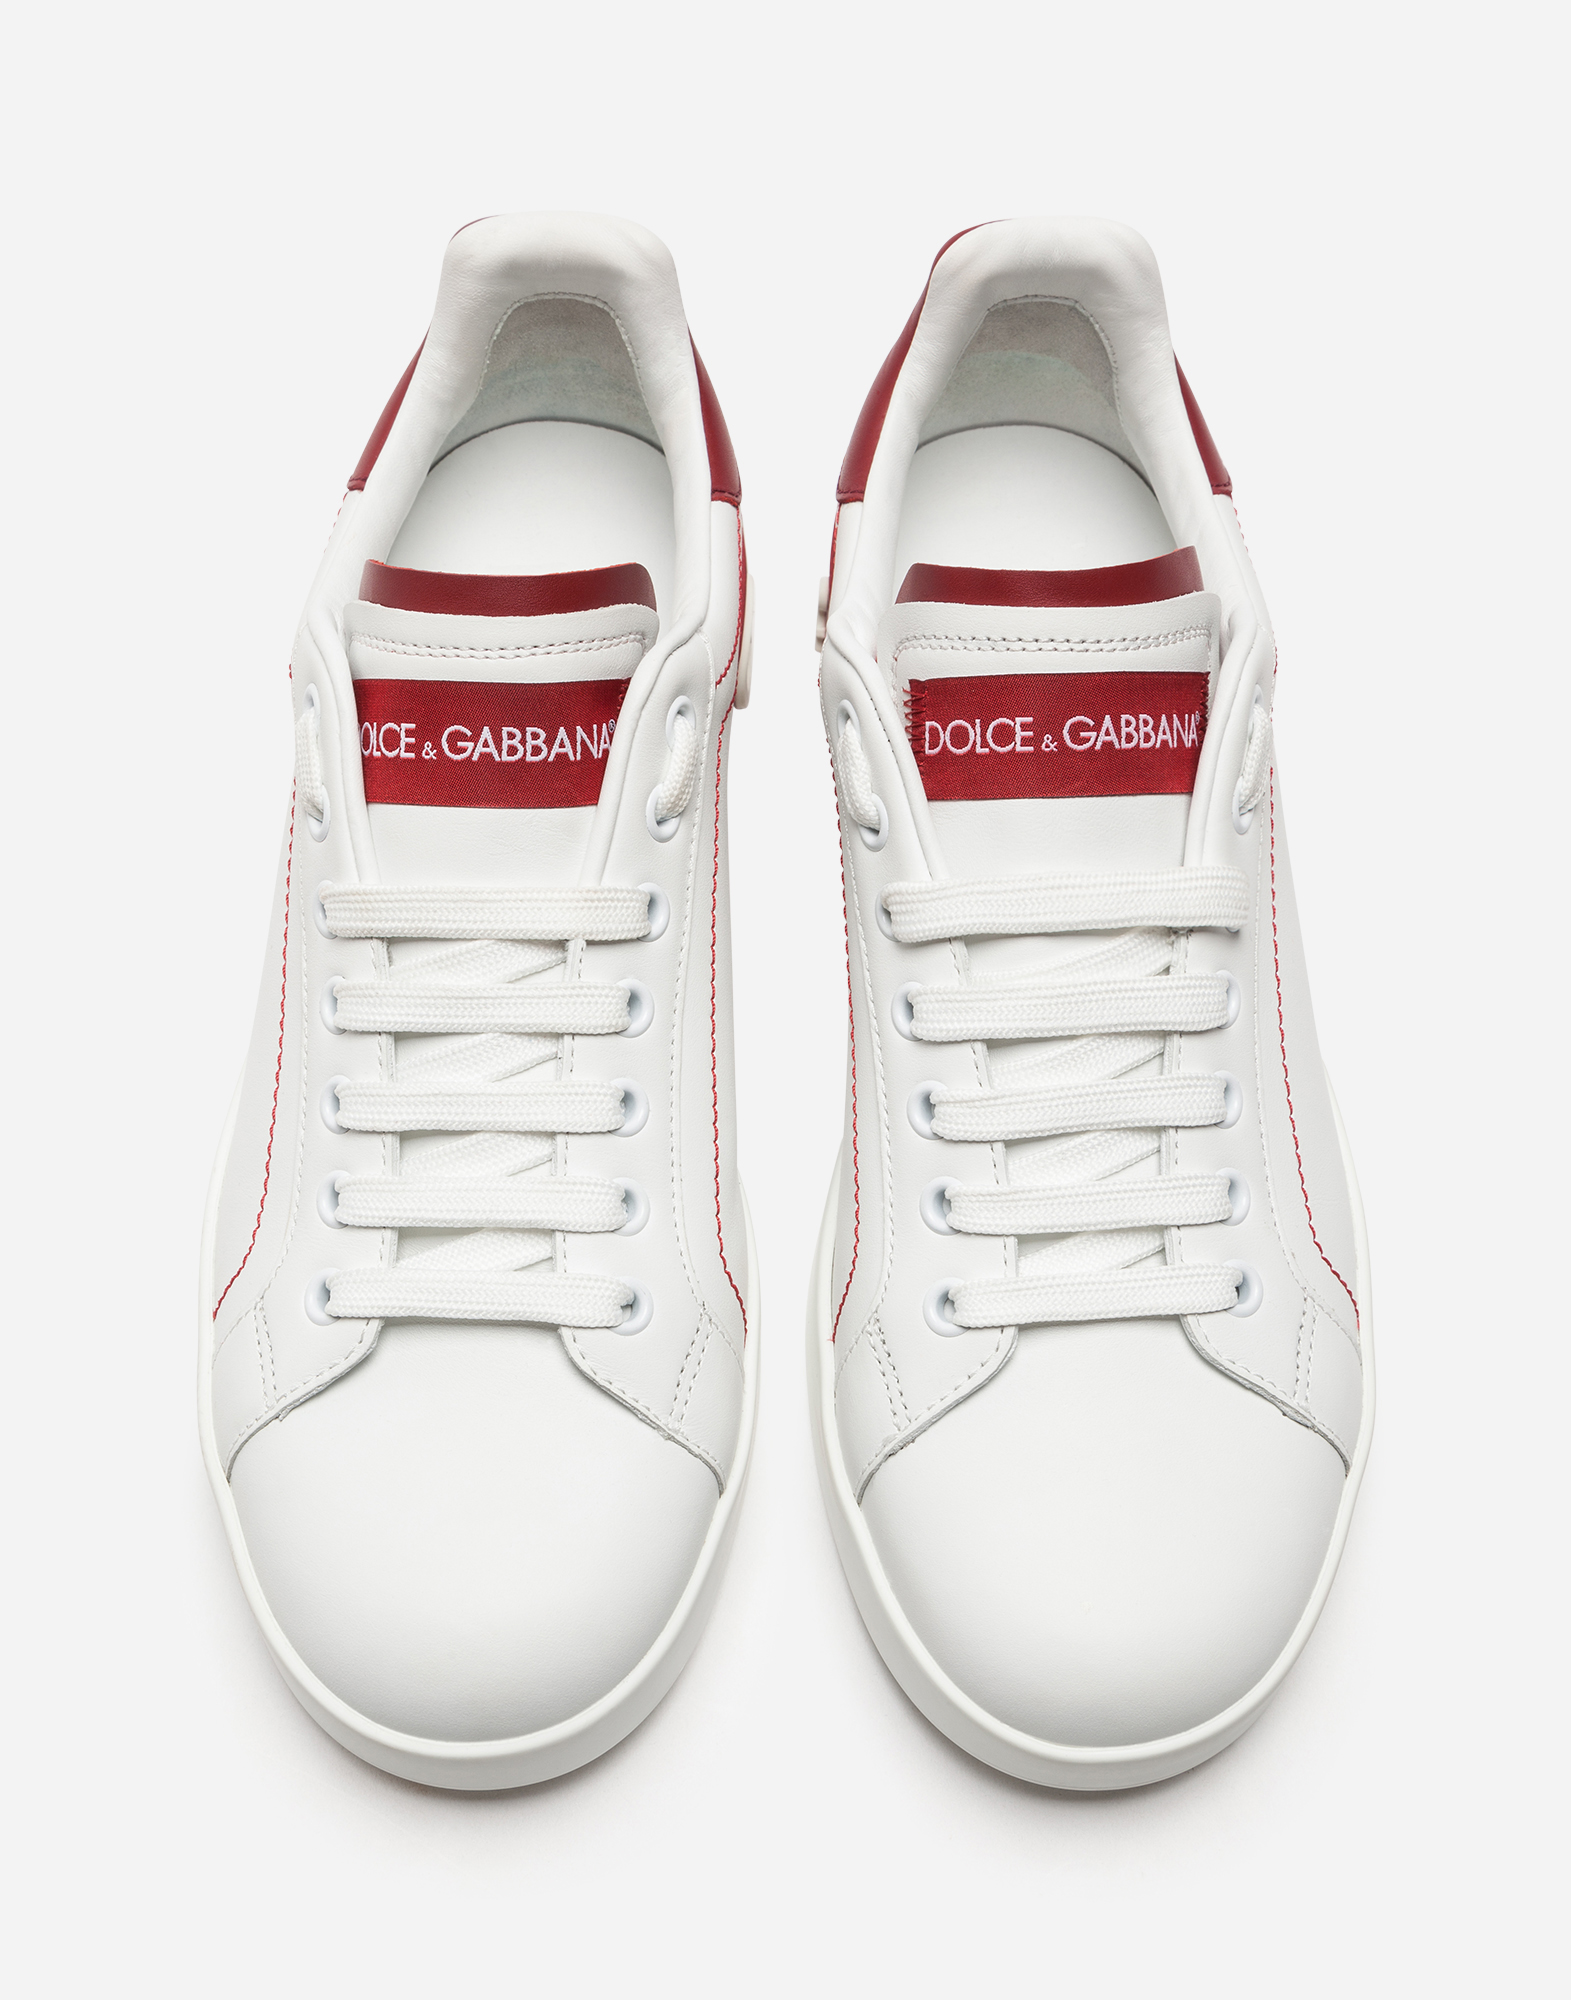 Dolce&Gabbana CALFSKIN NAPPA PORTOFINO SNEAKERS